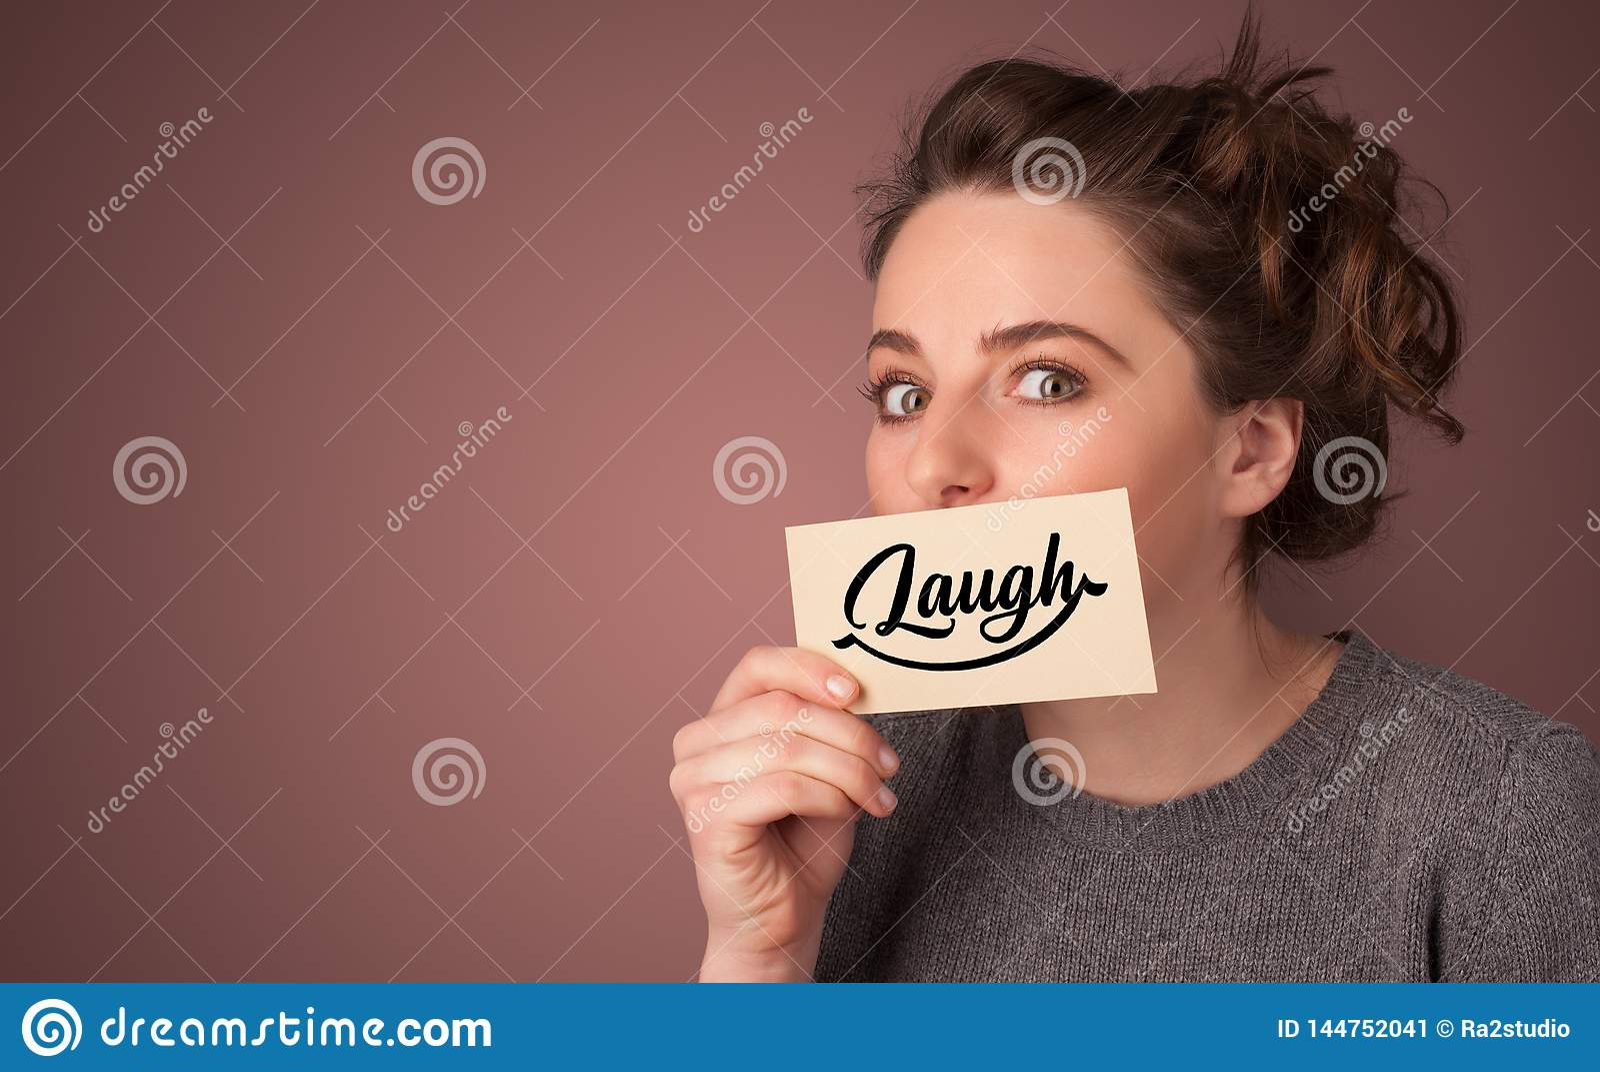 Tarjeta de la tenencia de la persona con sonrisa